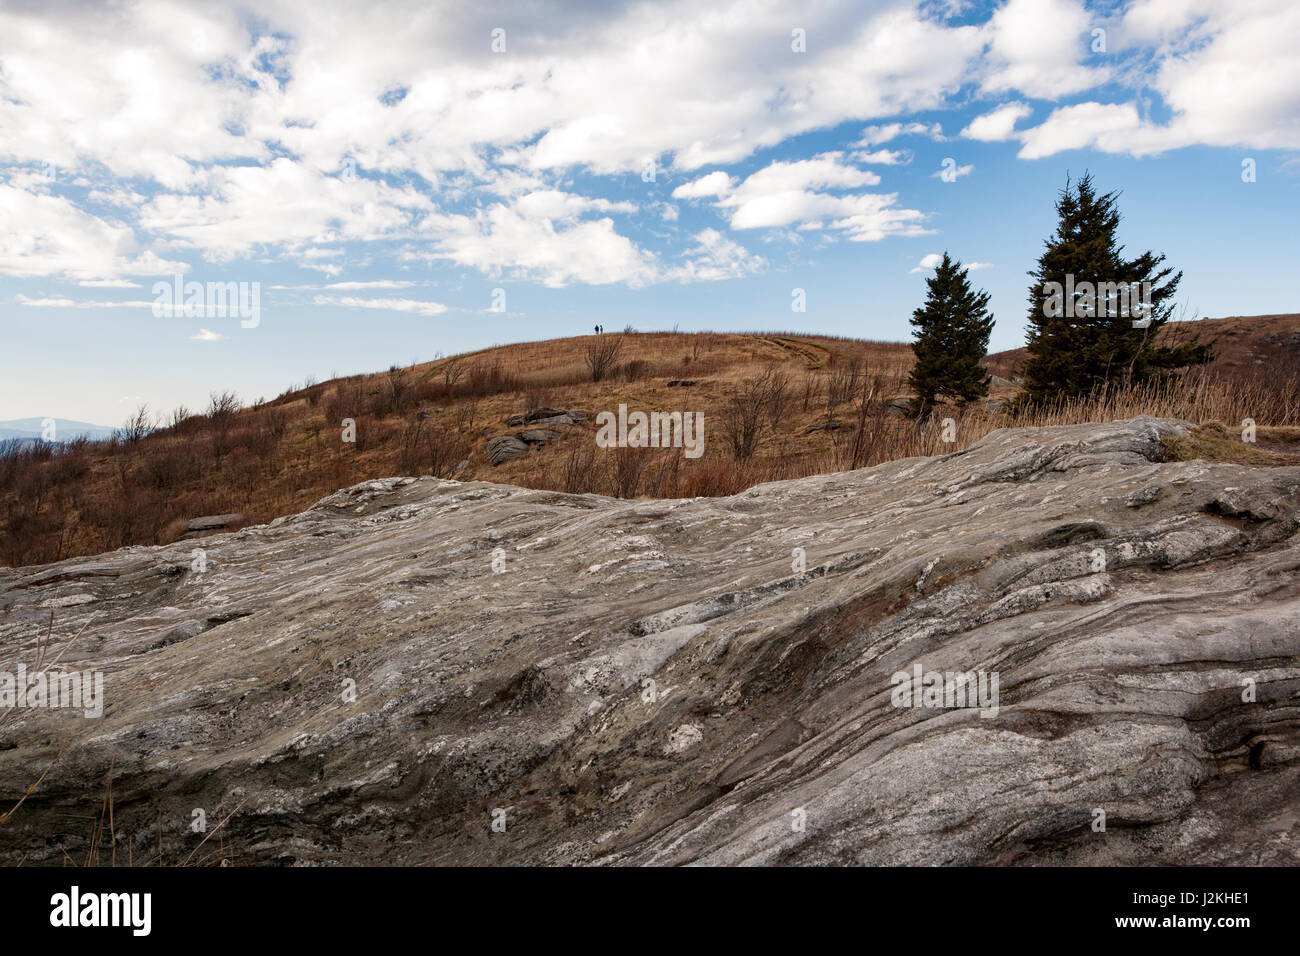 Views from Art Loeb Trail near Black Balsam Knob - Blue Ridge Parkway, North Carolina, USA Stock Photo